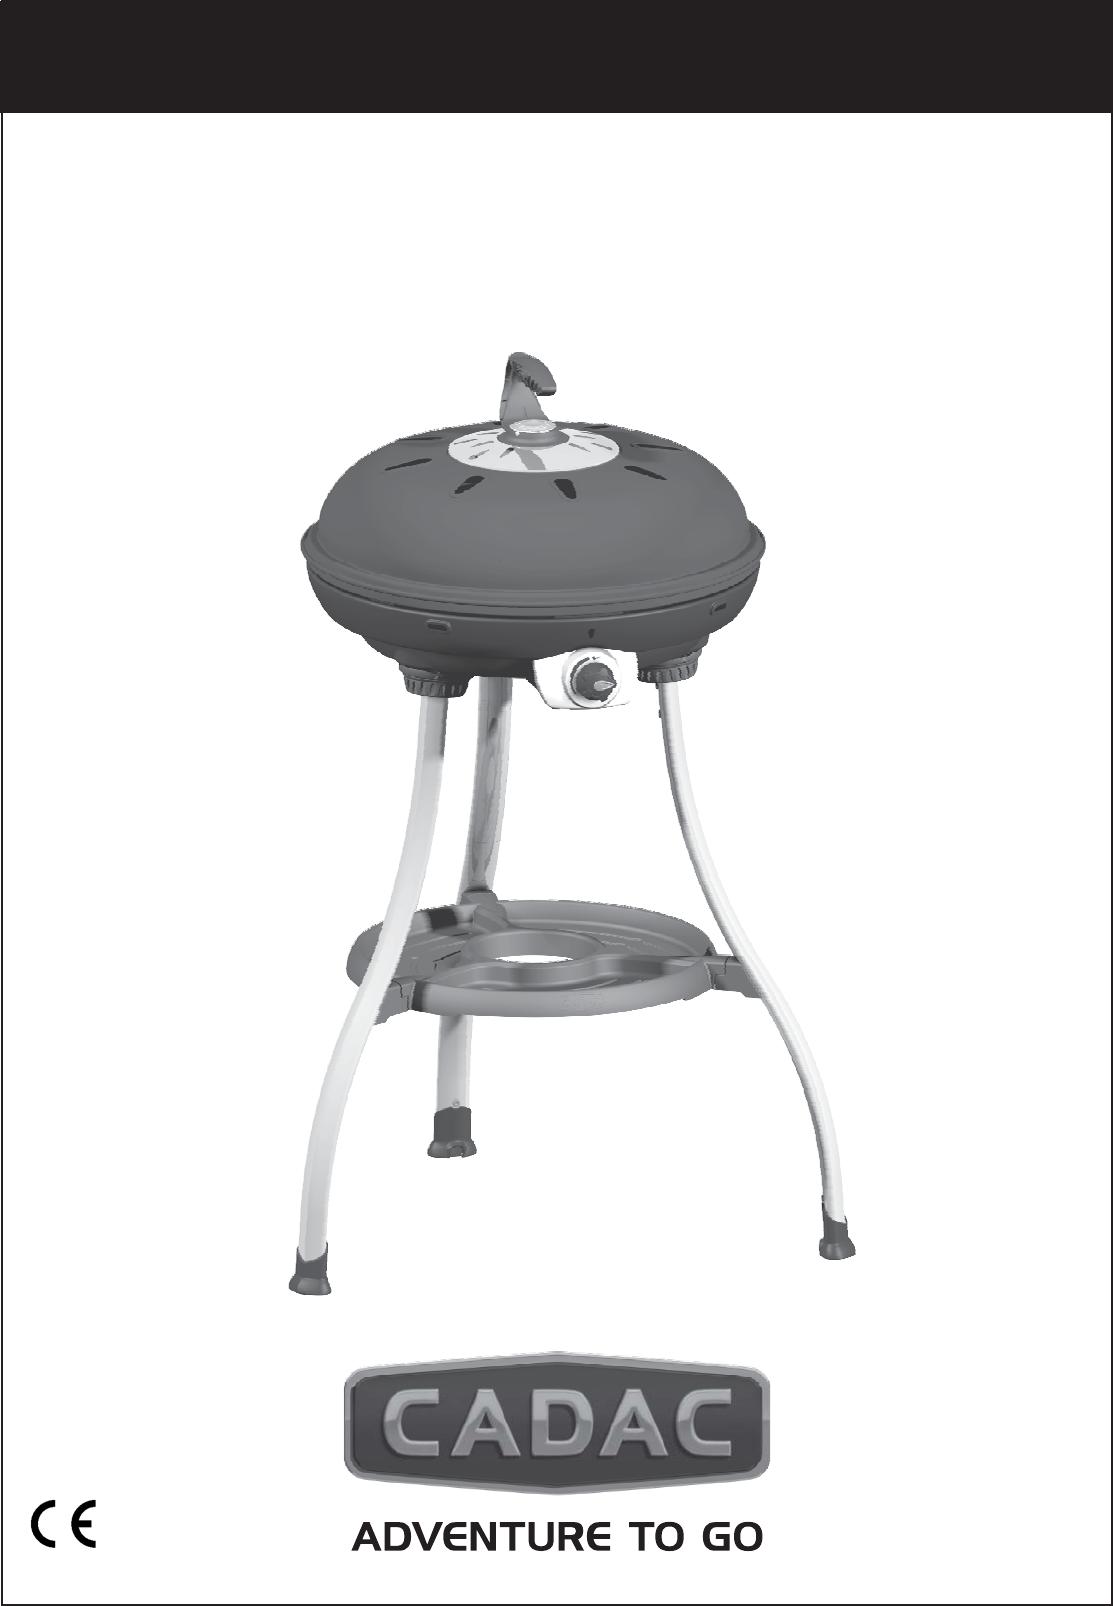 Cadac Carri Chef 2 Bbq Skottel Combo.User Manual Cadac Carri Chef 2 Bbq Skottel Combo 13 Pages